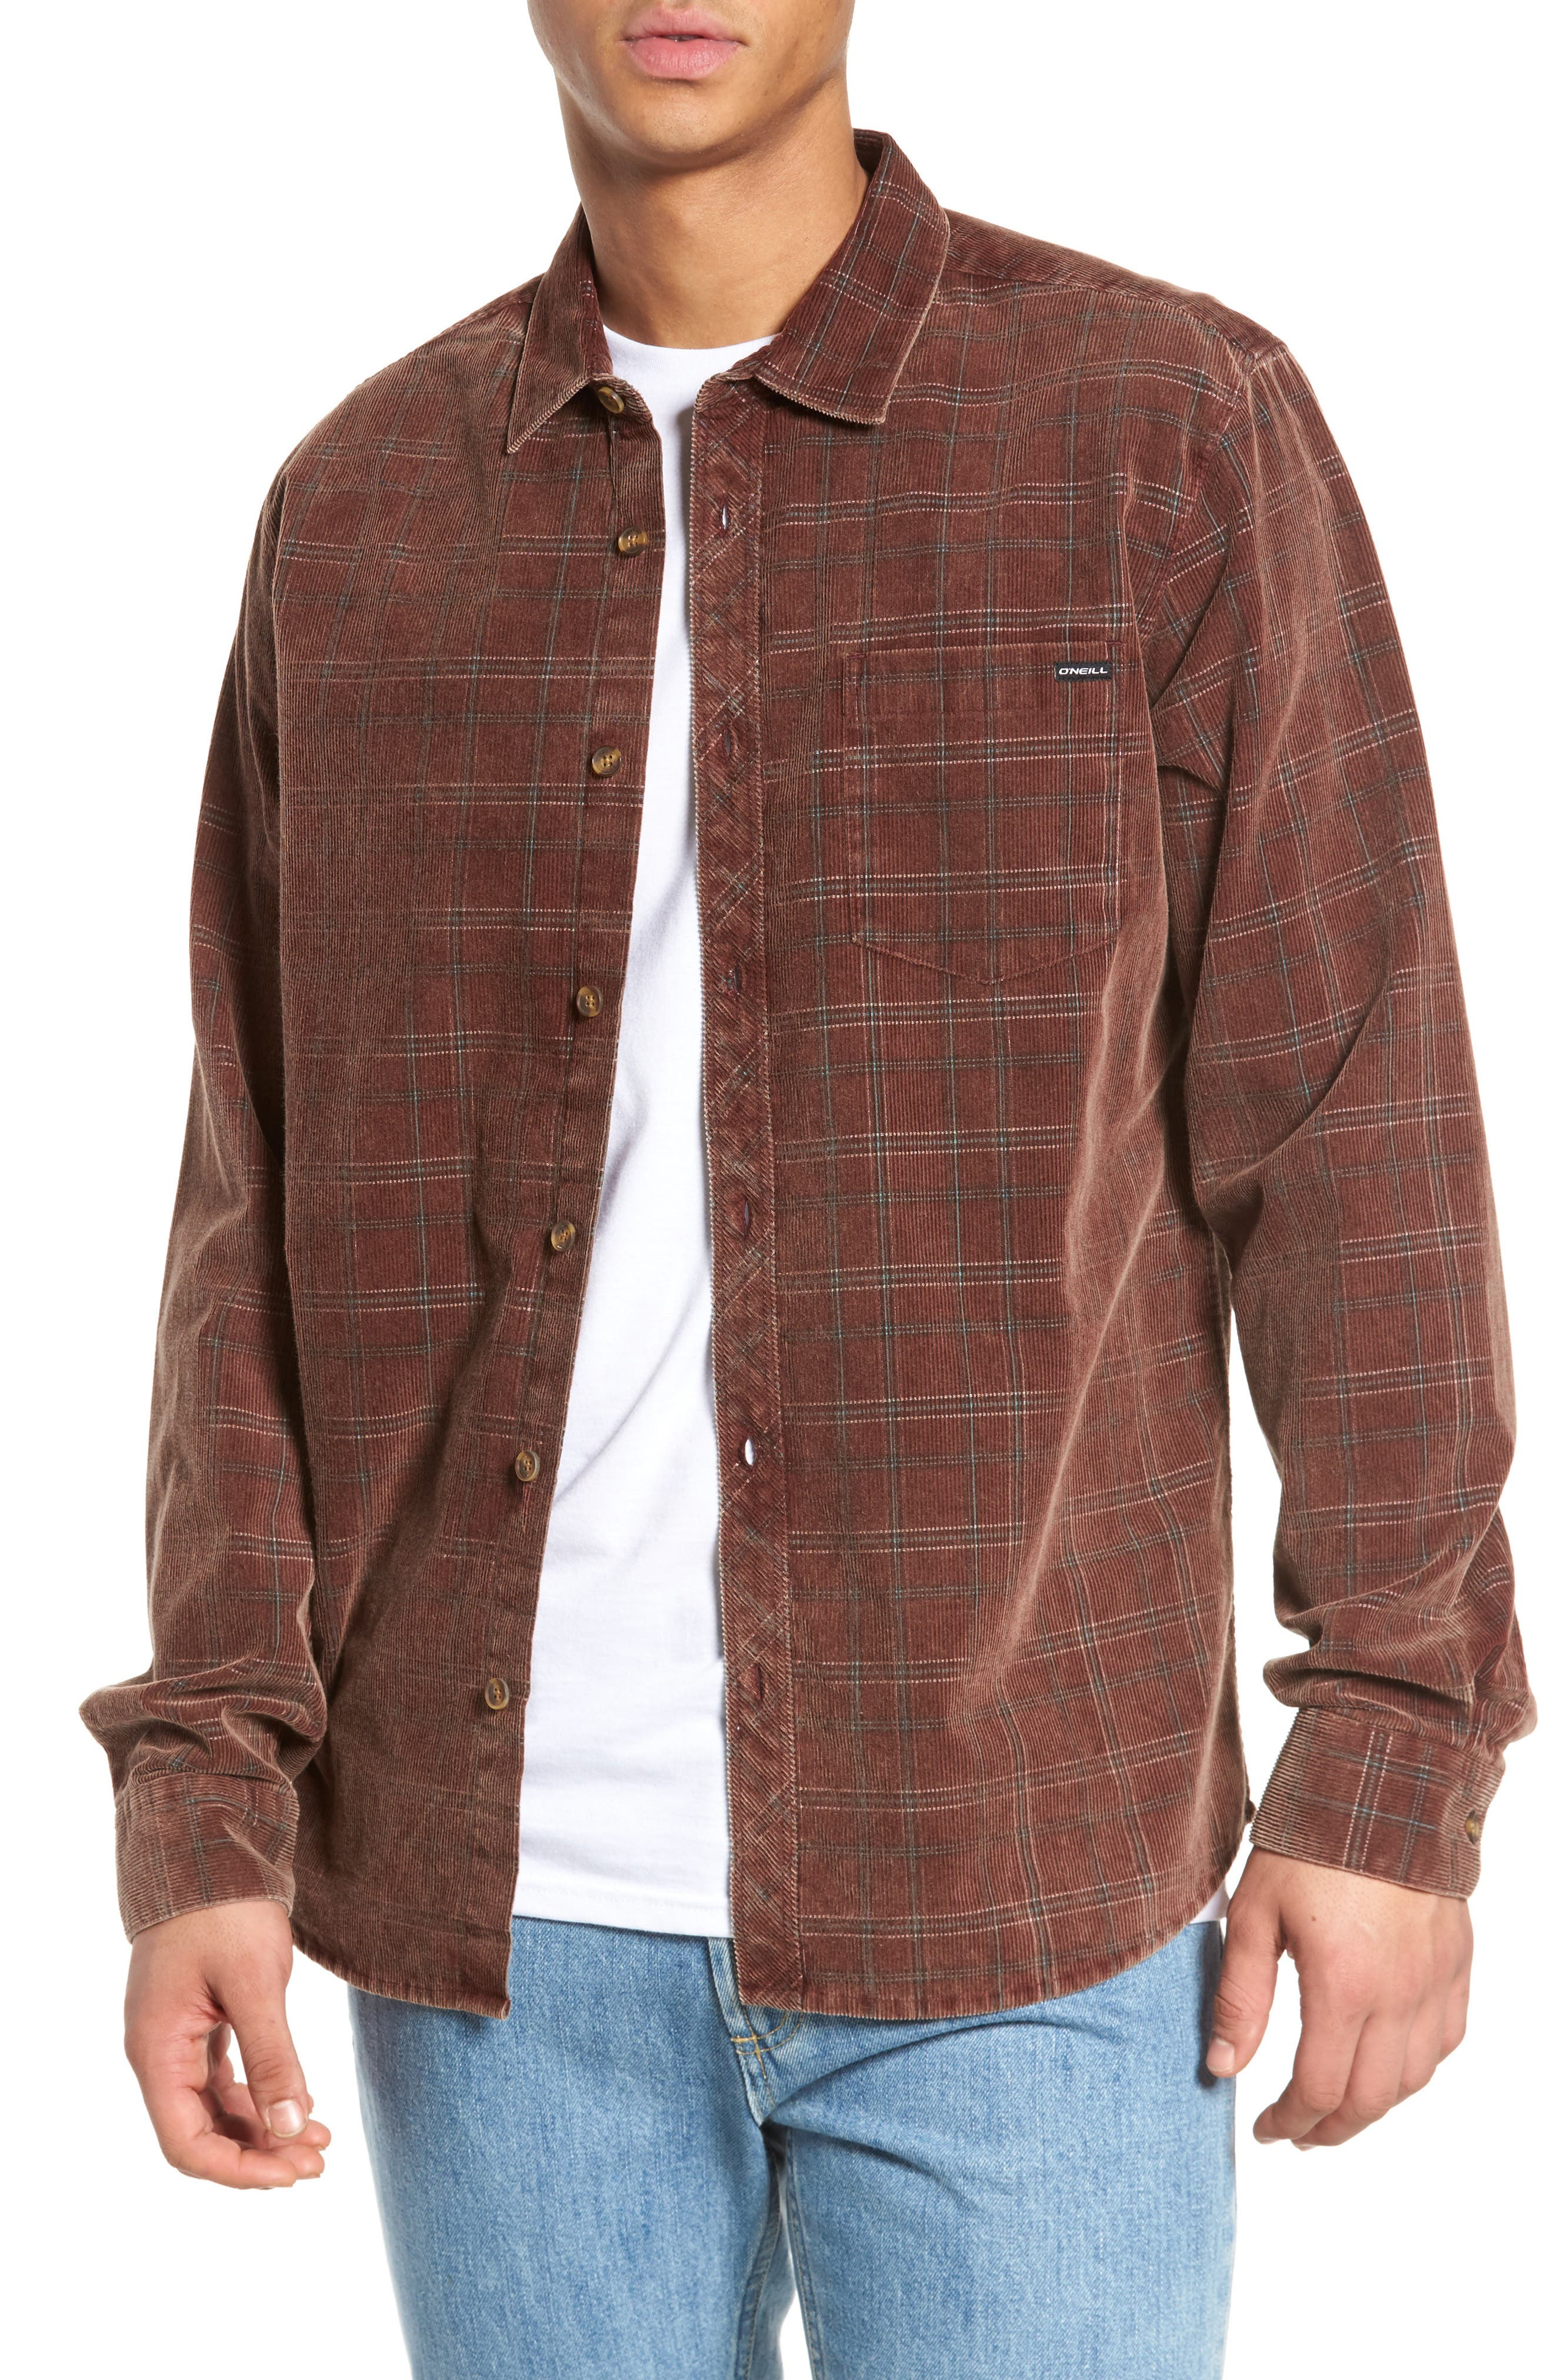 Bradley Corduroy Shirt,                             Main thumbnail 1, color,                             Burgundy